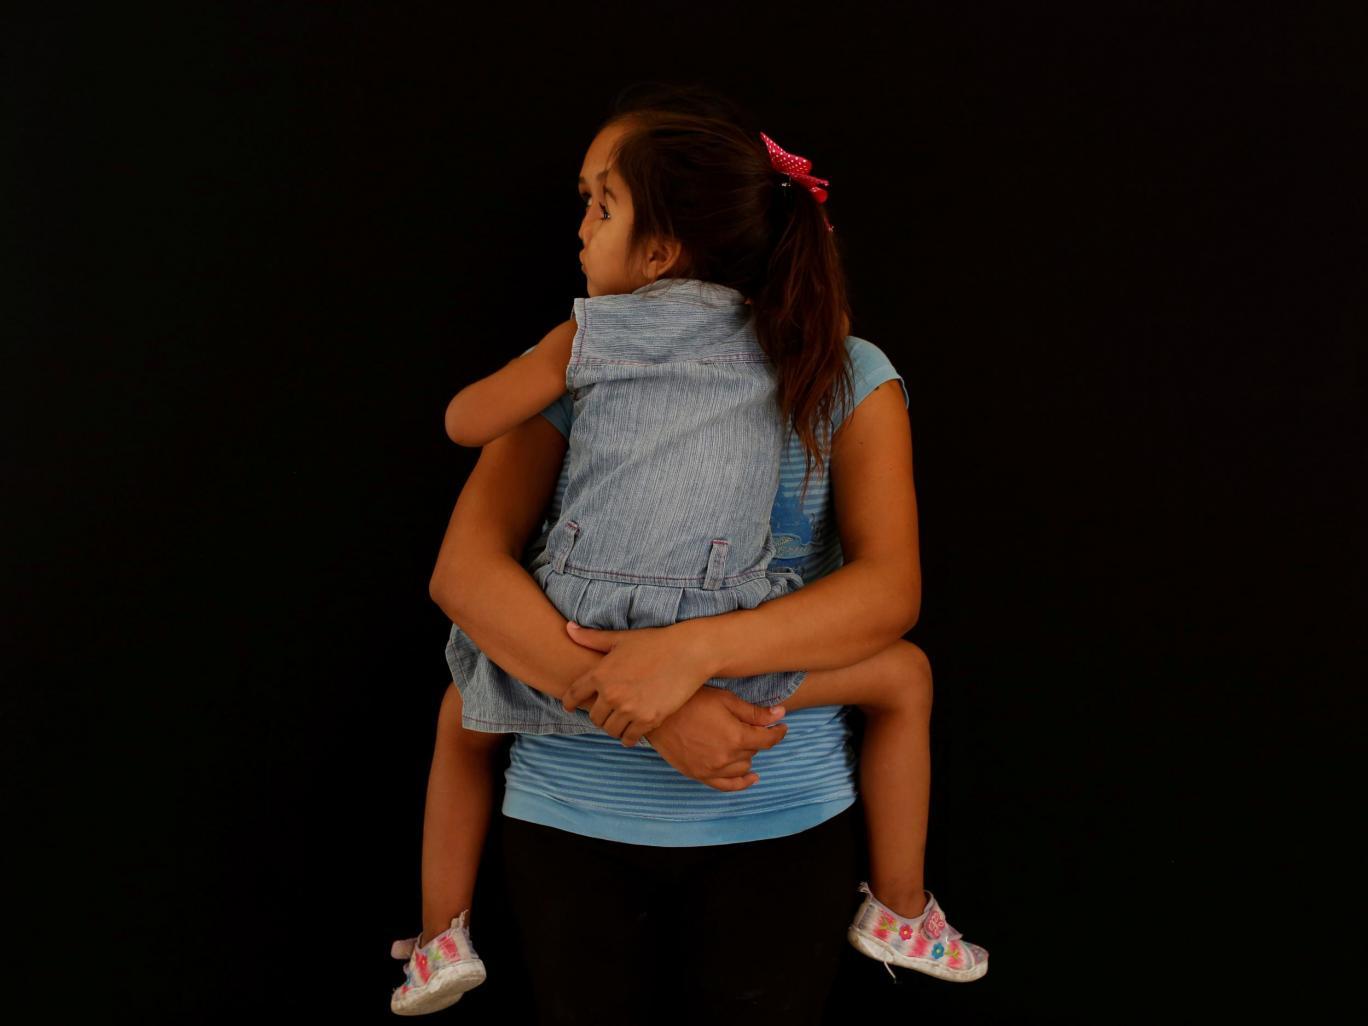 Honduras bans child marriage, no exceptions